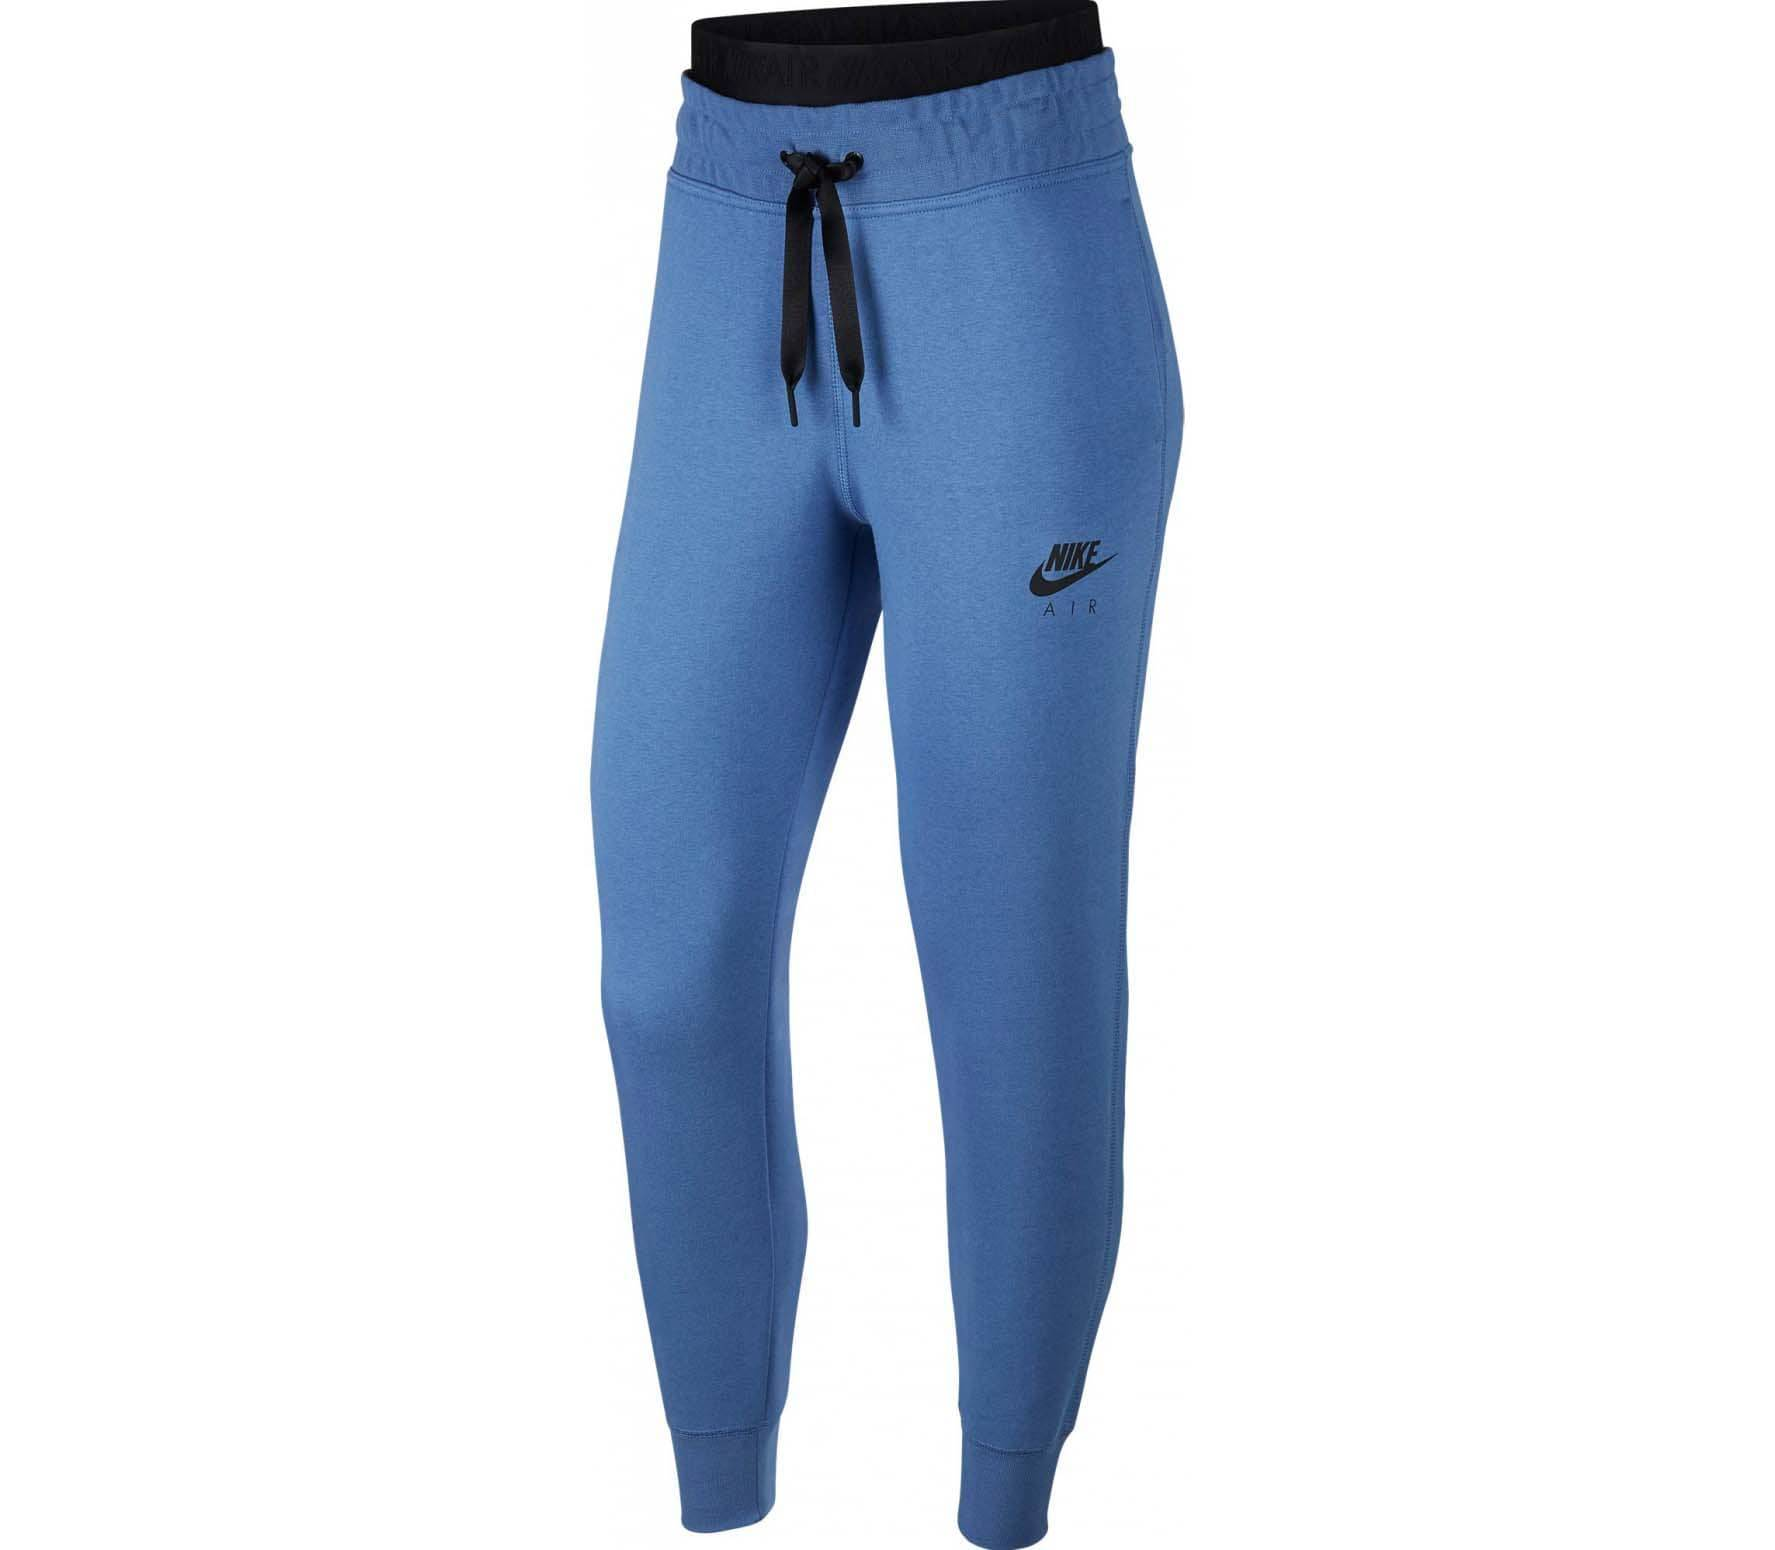 Nike Sportswear - Air Fleece Dam pants (blå) - M